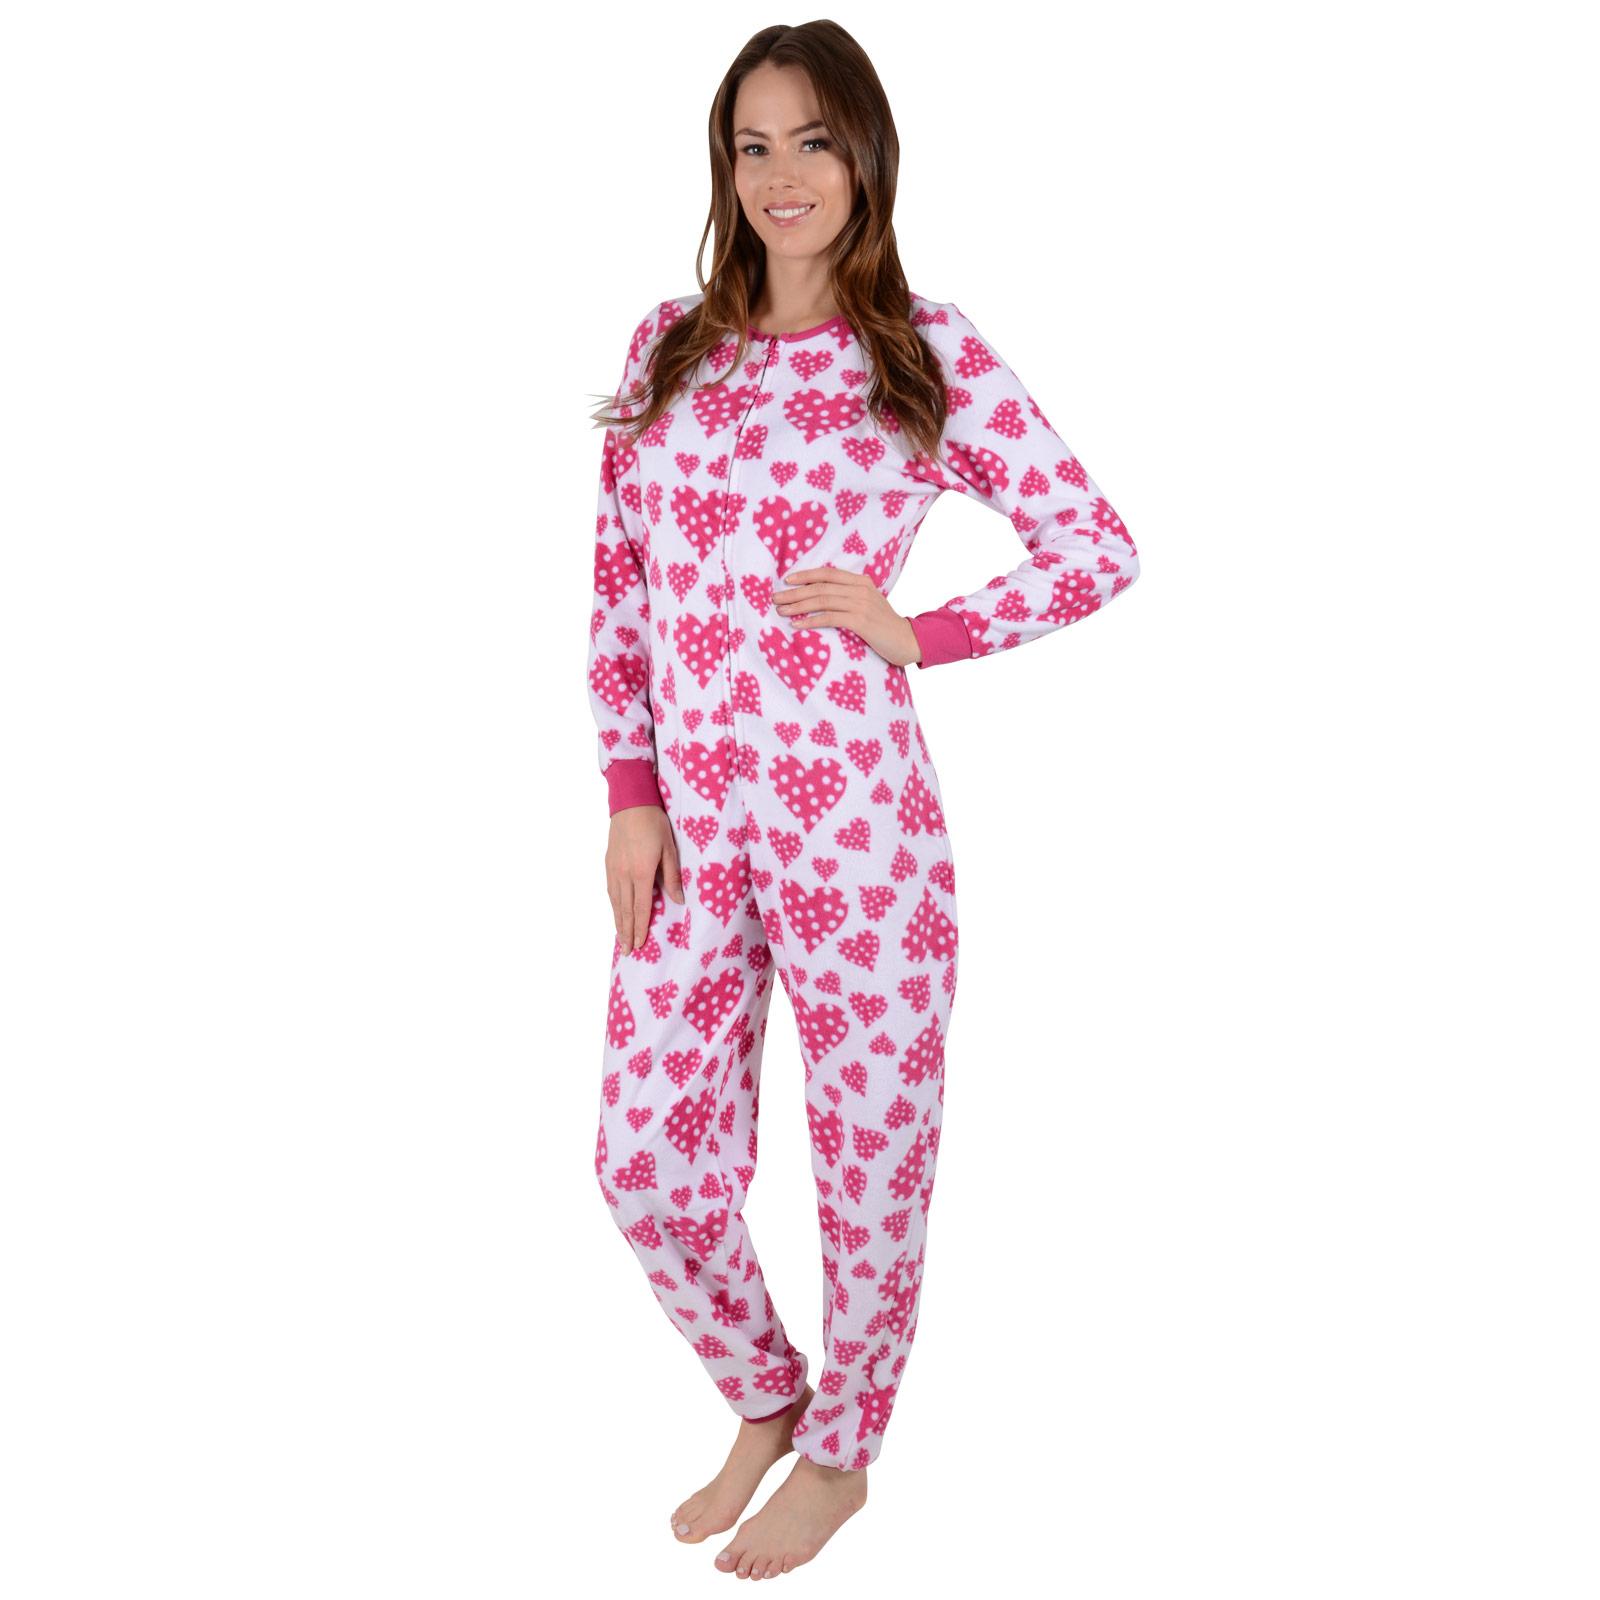 Ladies Fleece All In One Piece Pyjamas Jump Sleep Suit Onesie PJs ... 97d34caef